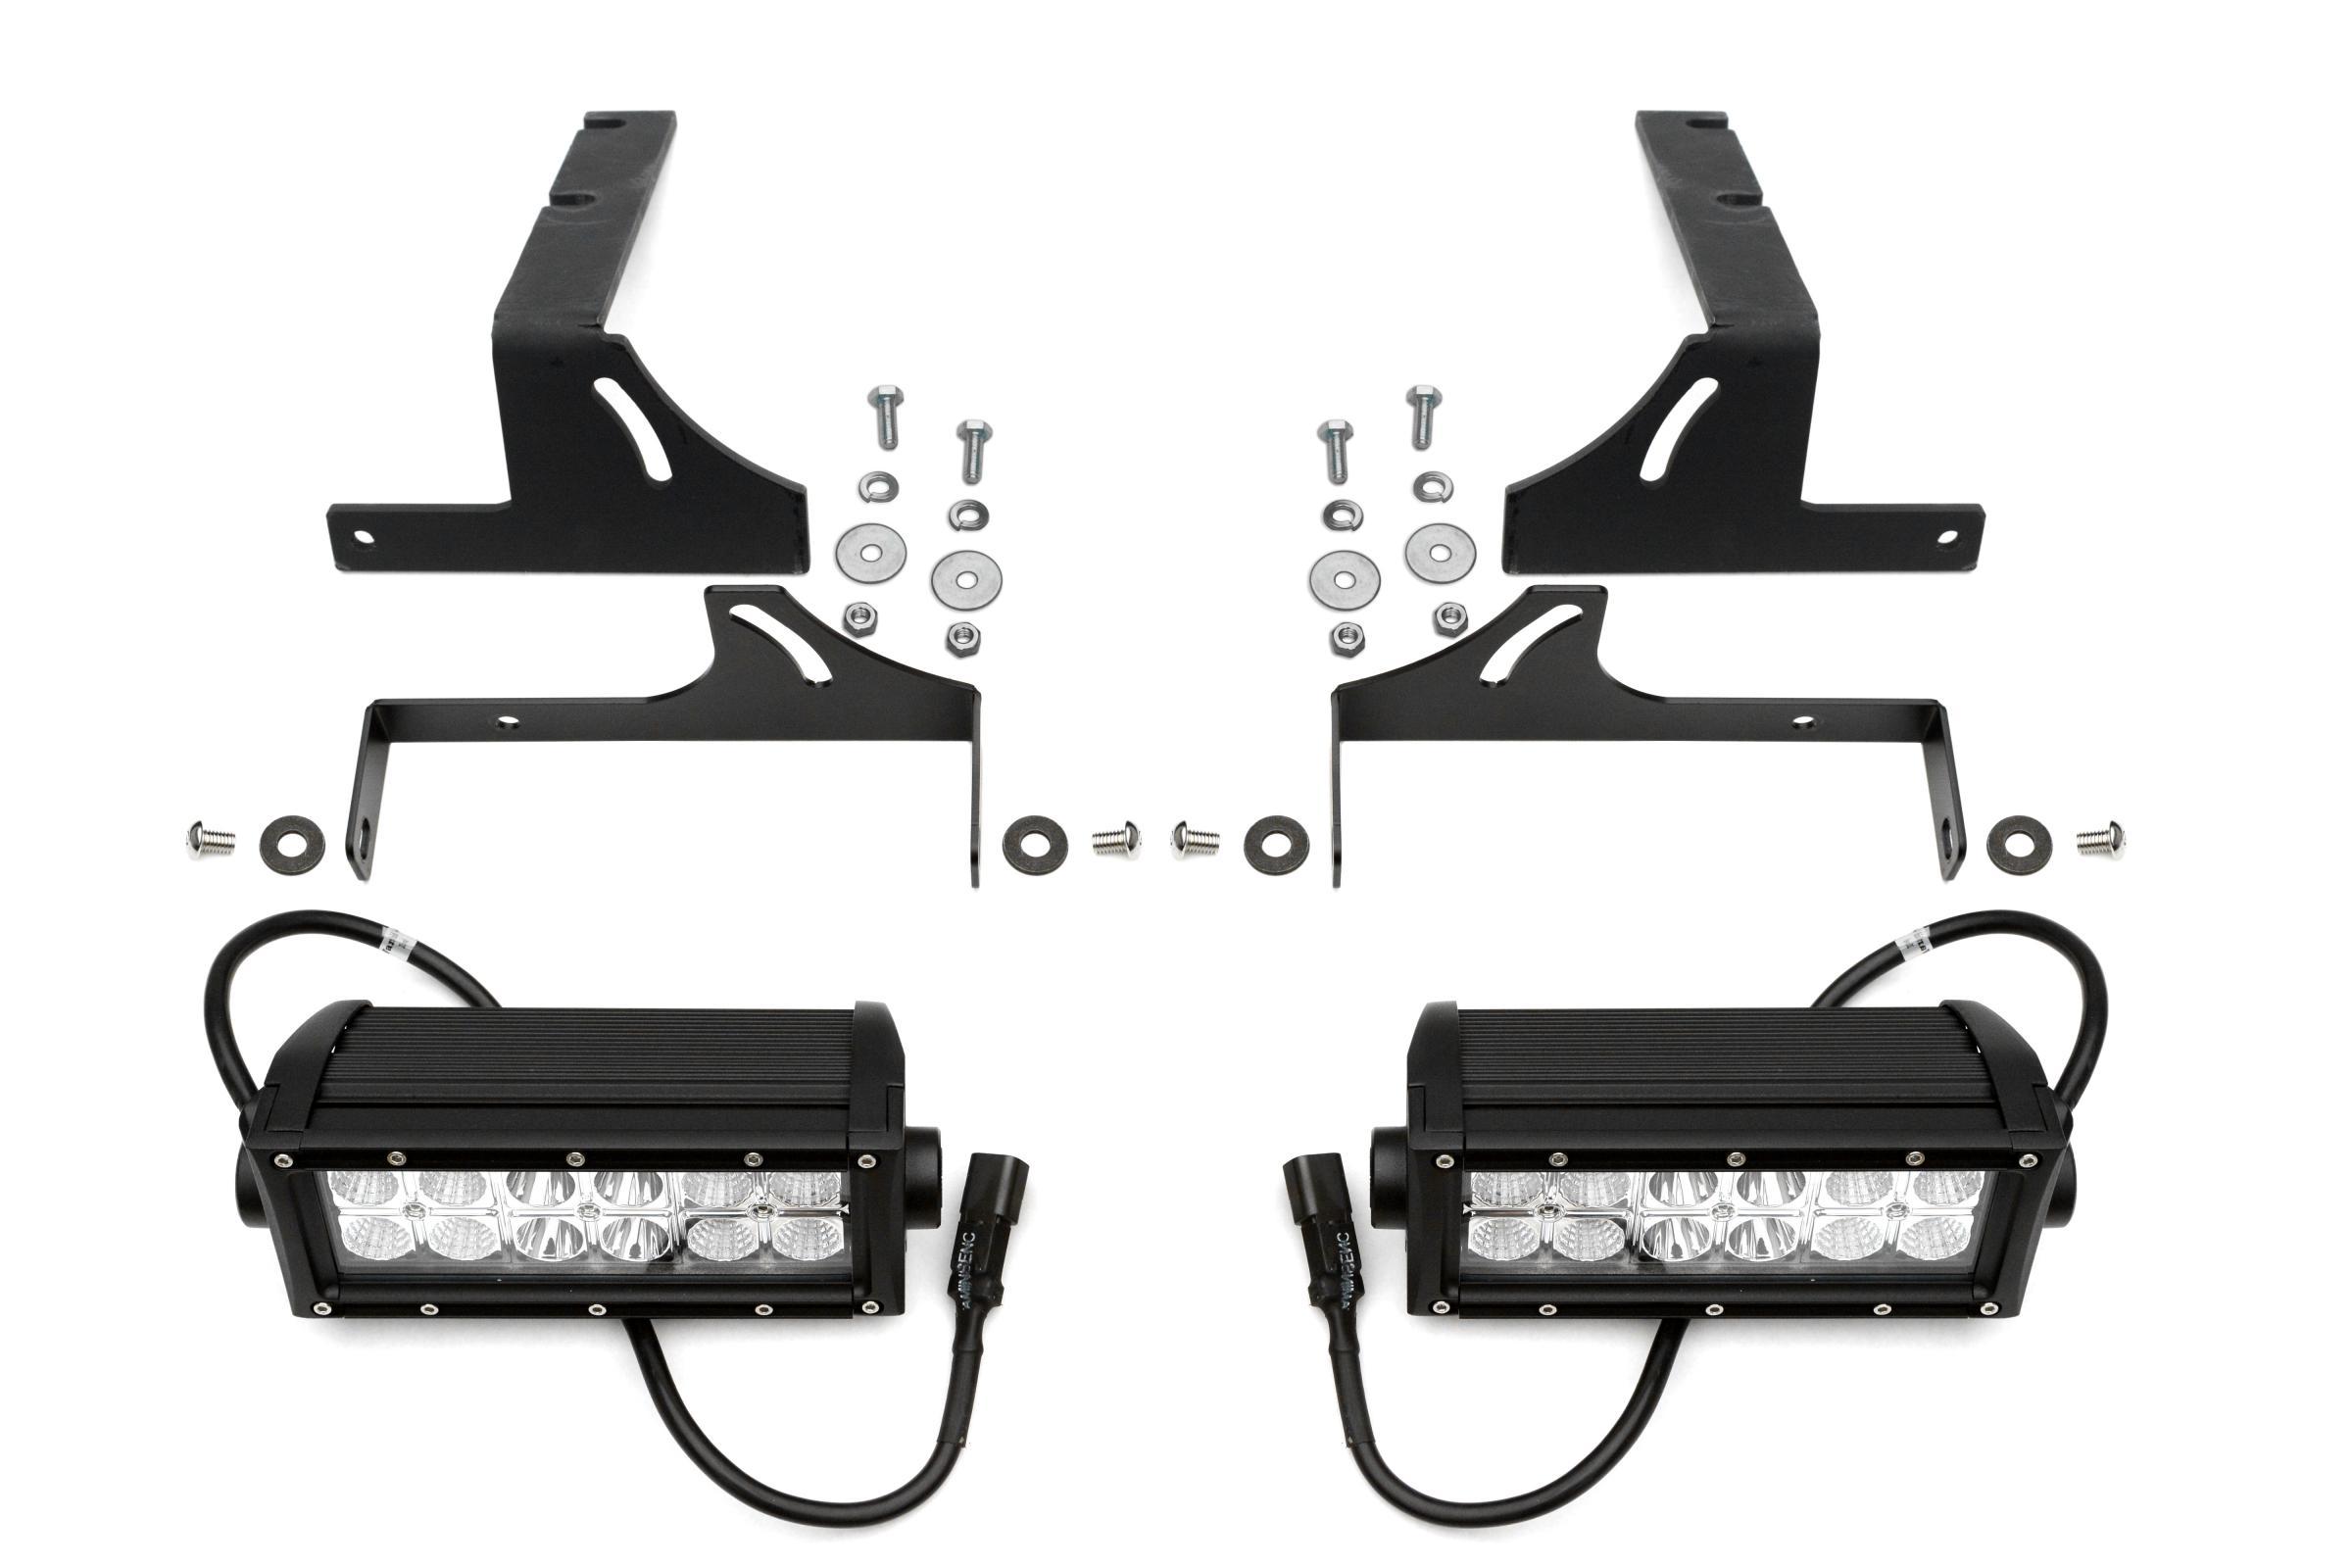 Universal Wiring Harness For Dual Led Light Barsw 200 Watt Or Below Tundra Rear Bumper Frame Bar Mount Kit 2014 2017 Swivel Adjustments W